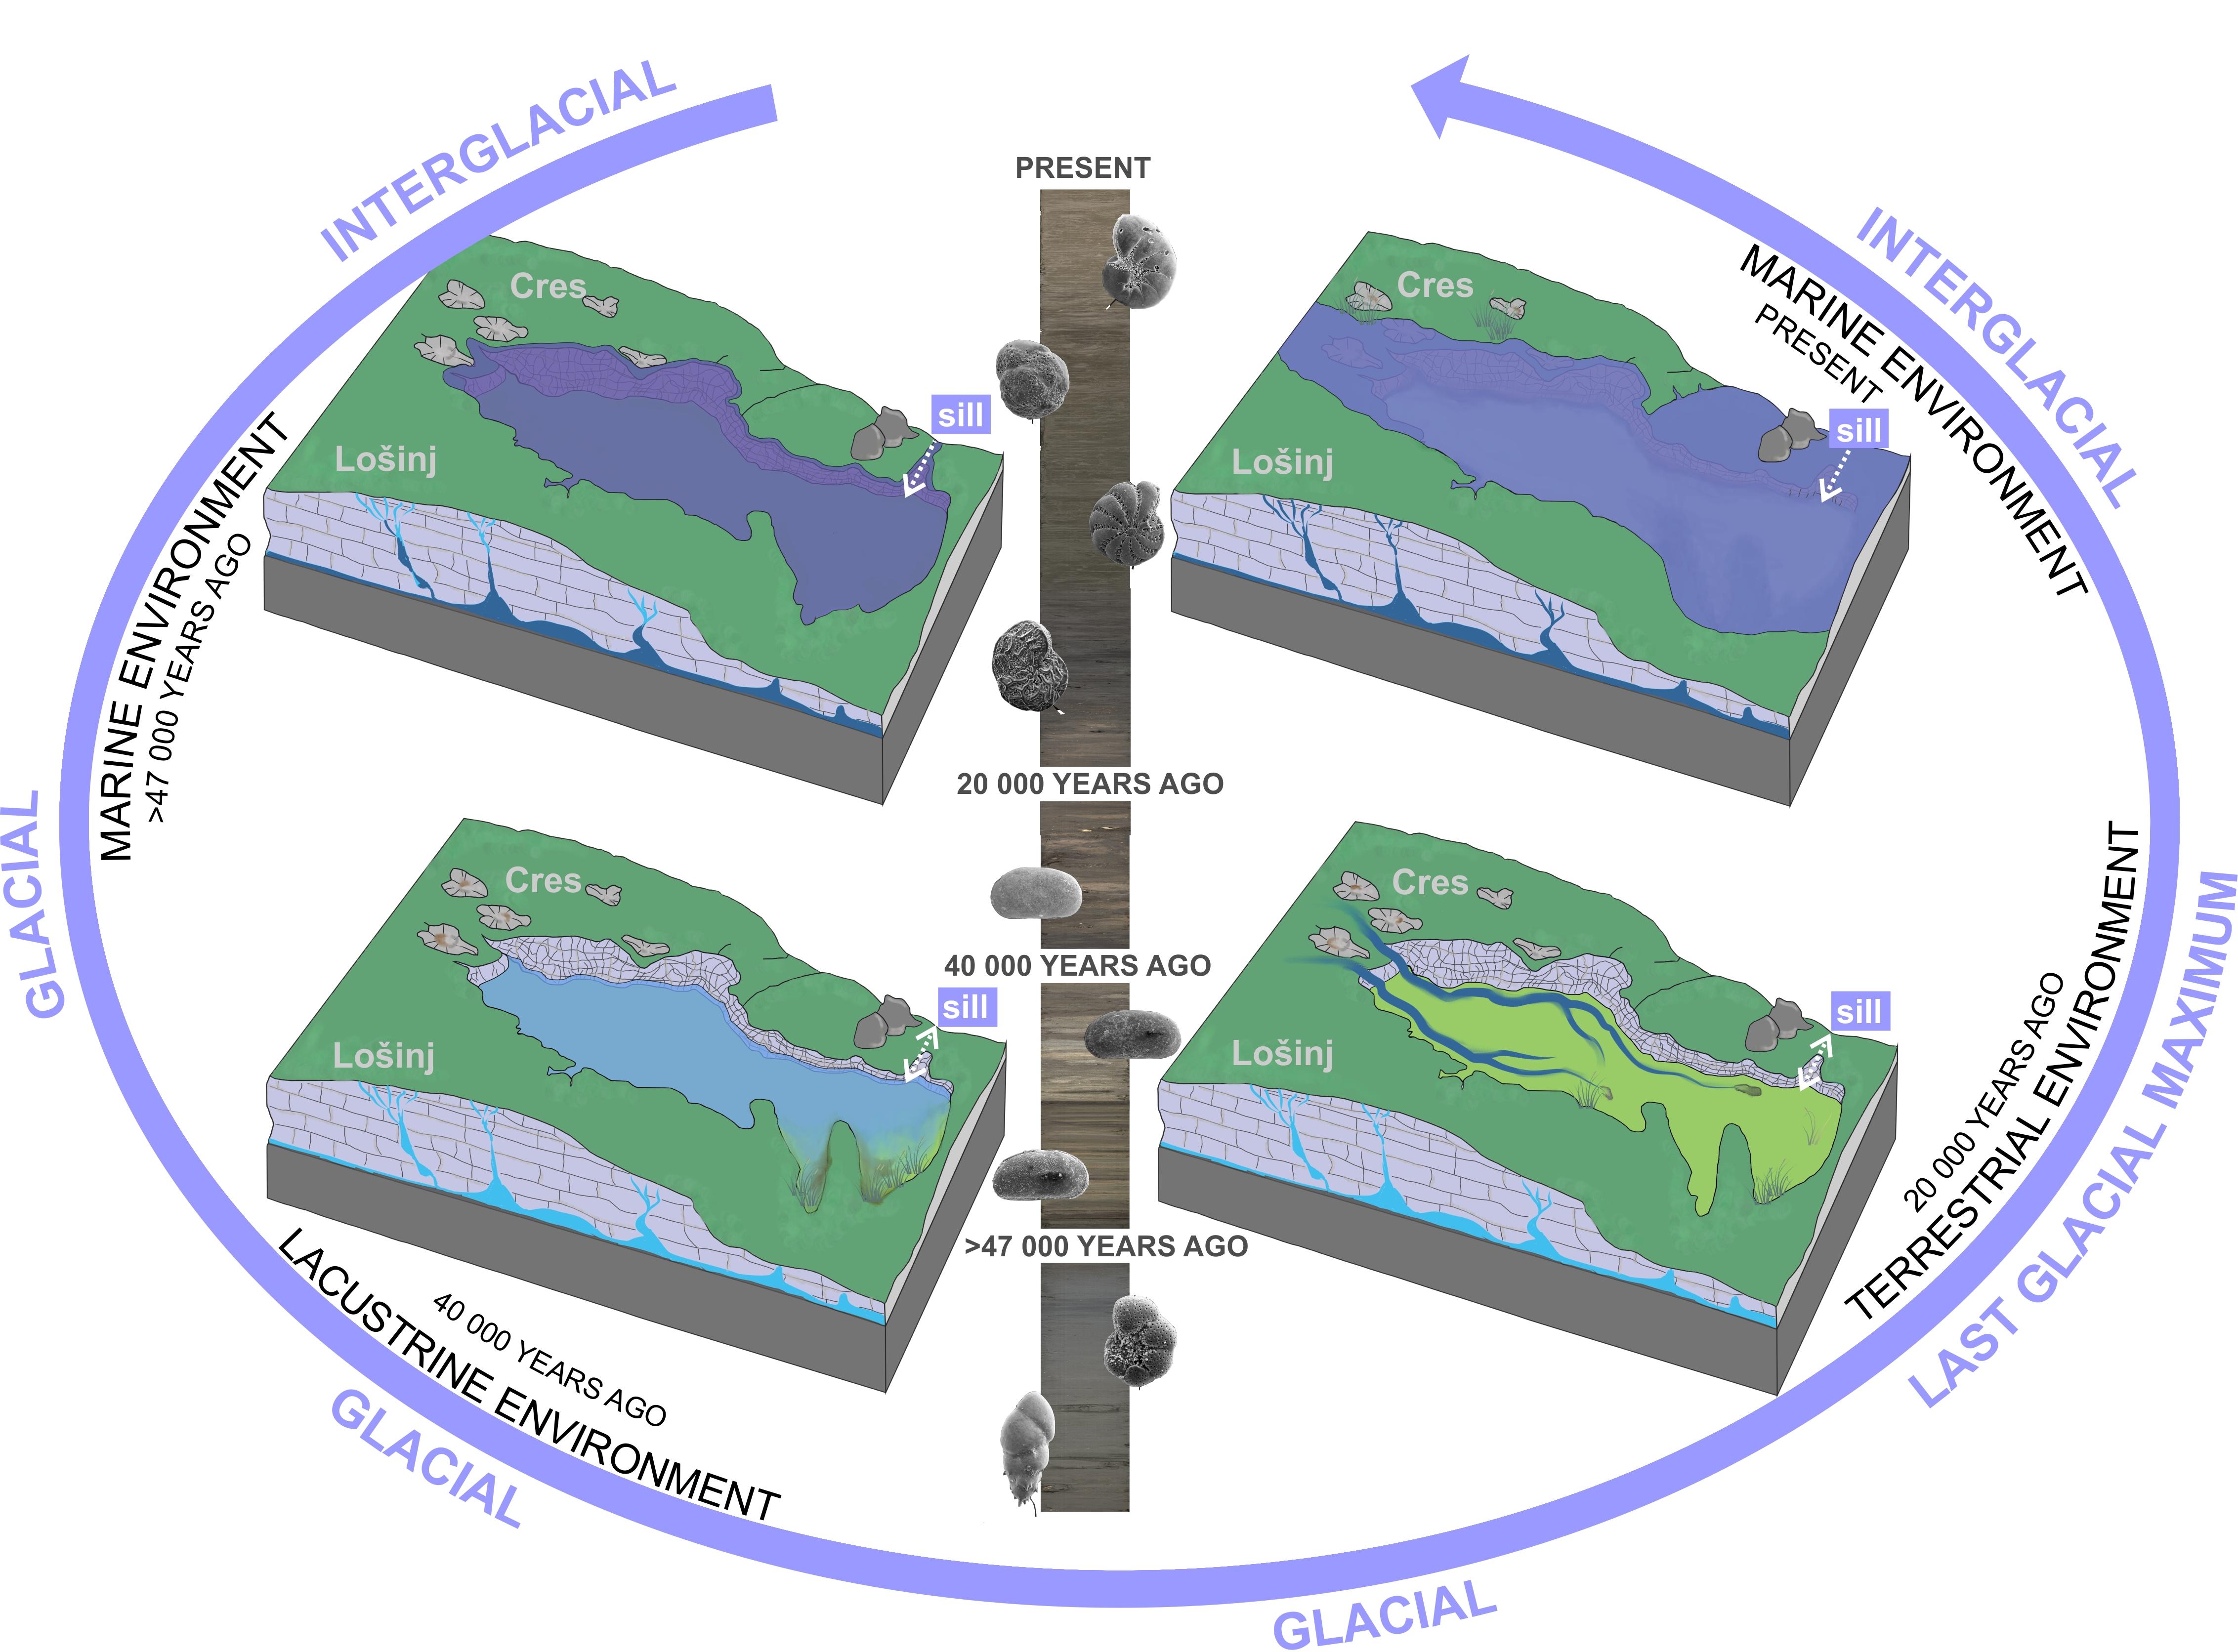 palaeoenvironmental changes in Lošinj Channel, Adriatic Sea